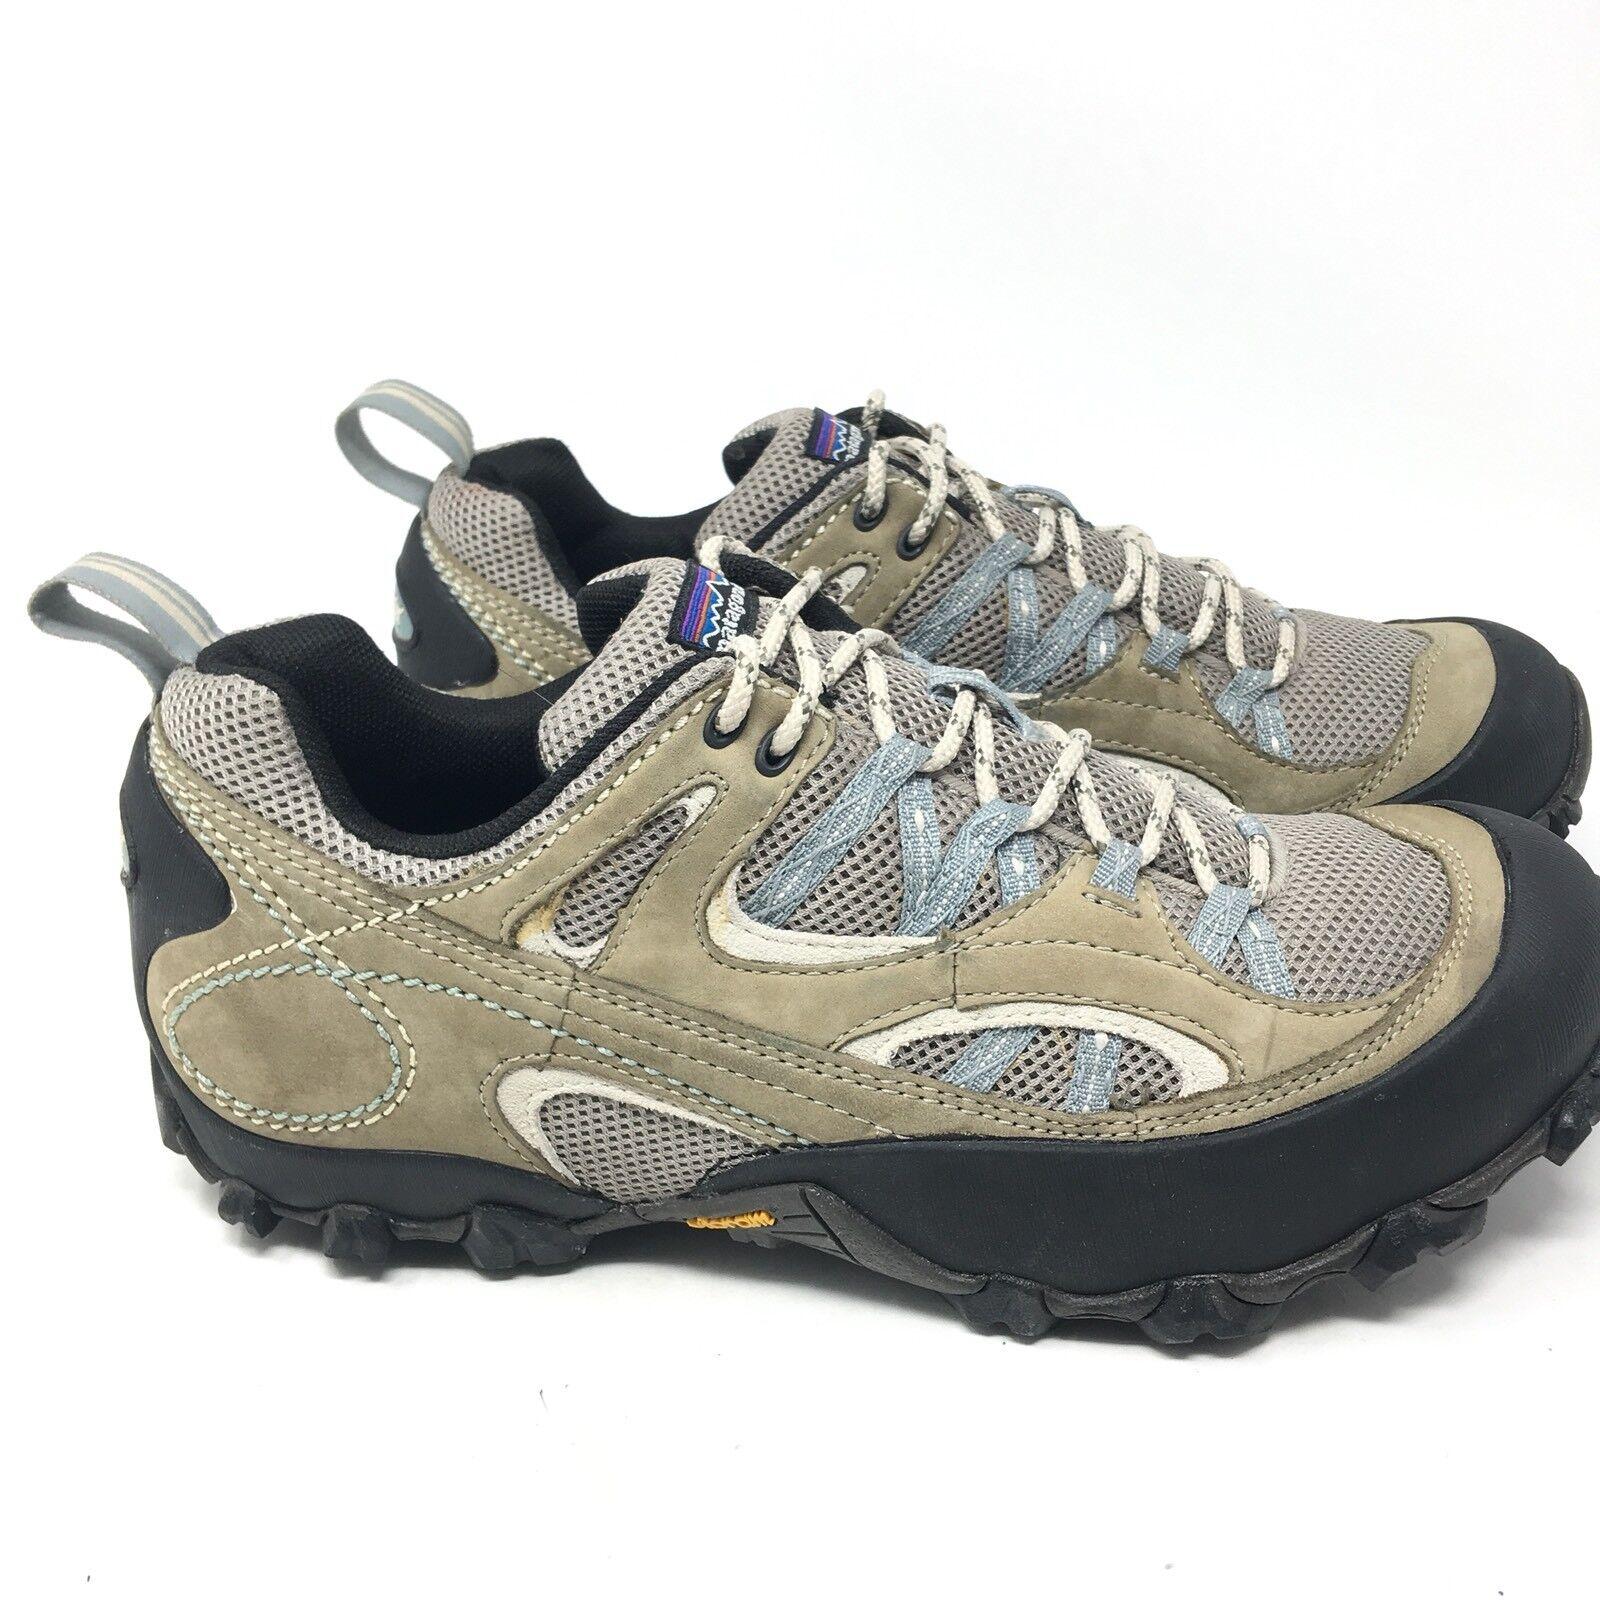 separation shoes 64067 e3146 Patagonia Women s Drifter A C Sage Khaki Hiking Trail Shoes Shoes Shoes Size  10 M Nike WMNS Air ...